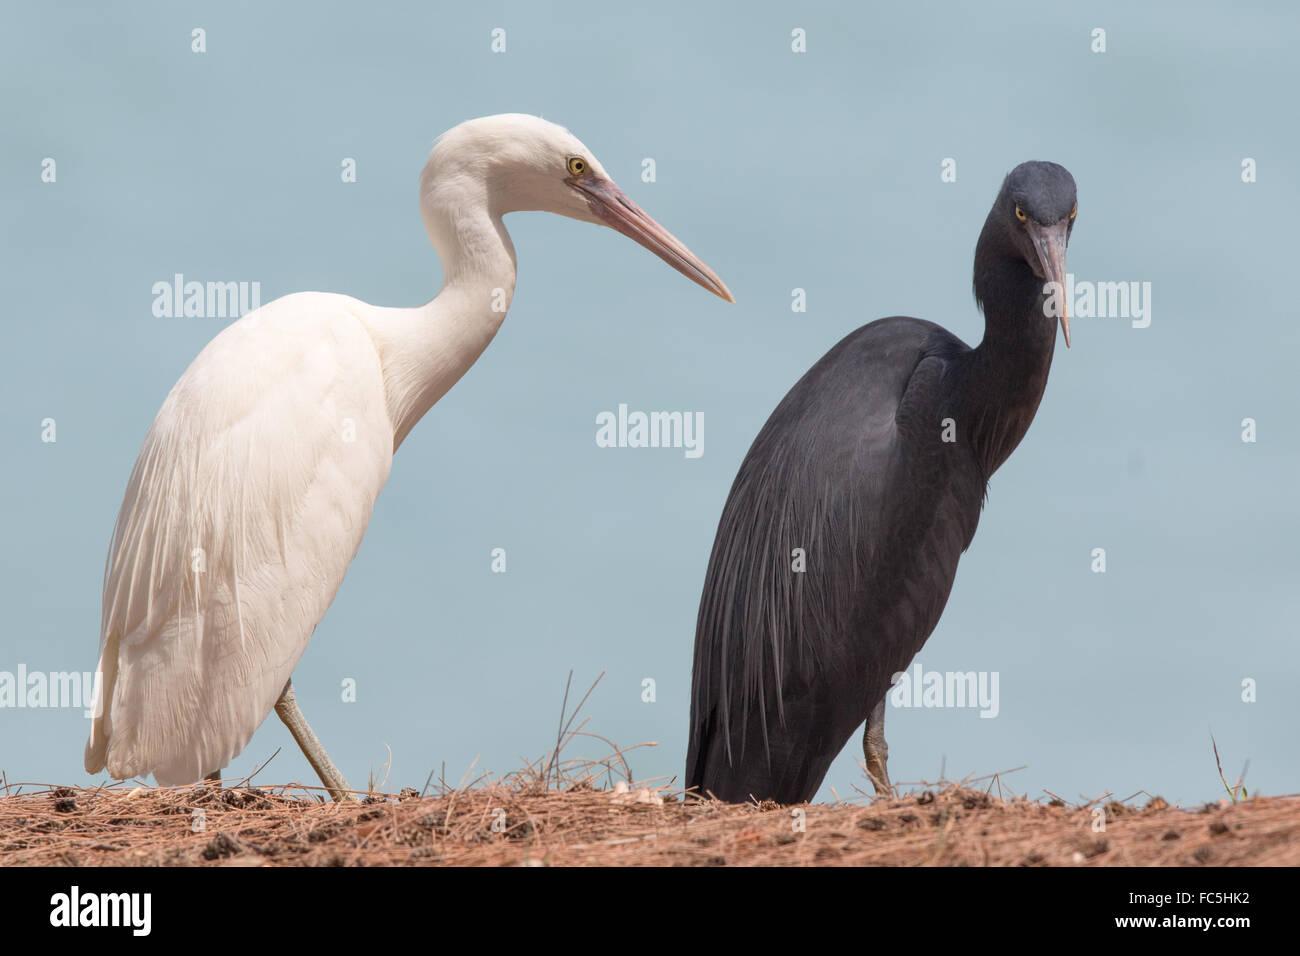 white and dark colour morphs of Pacific Reef Egret (Egretta sacra) - Stock Image